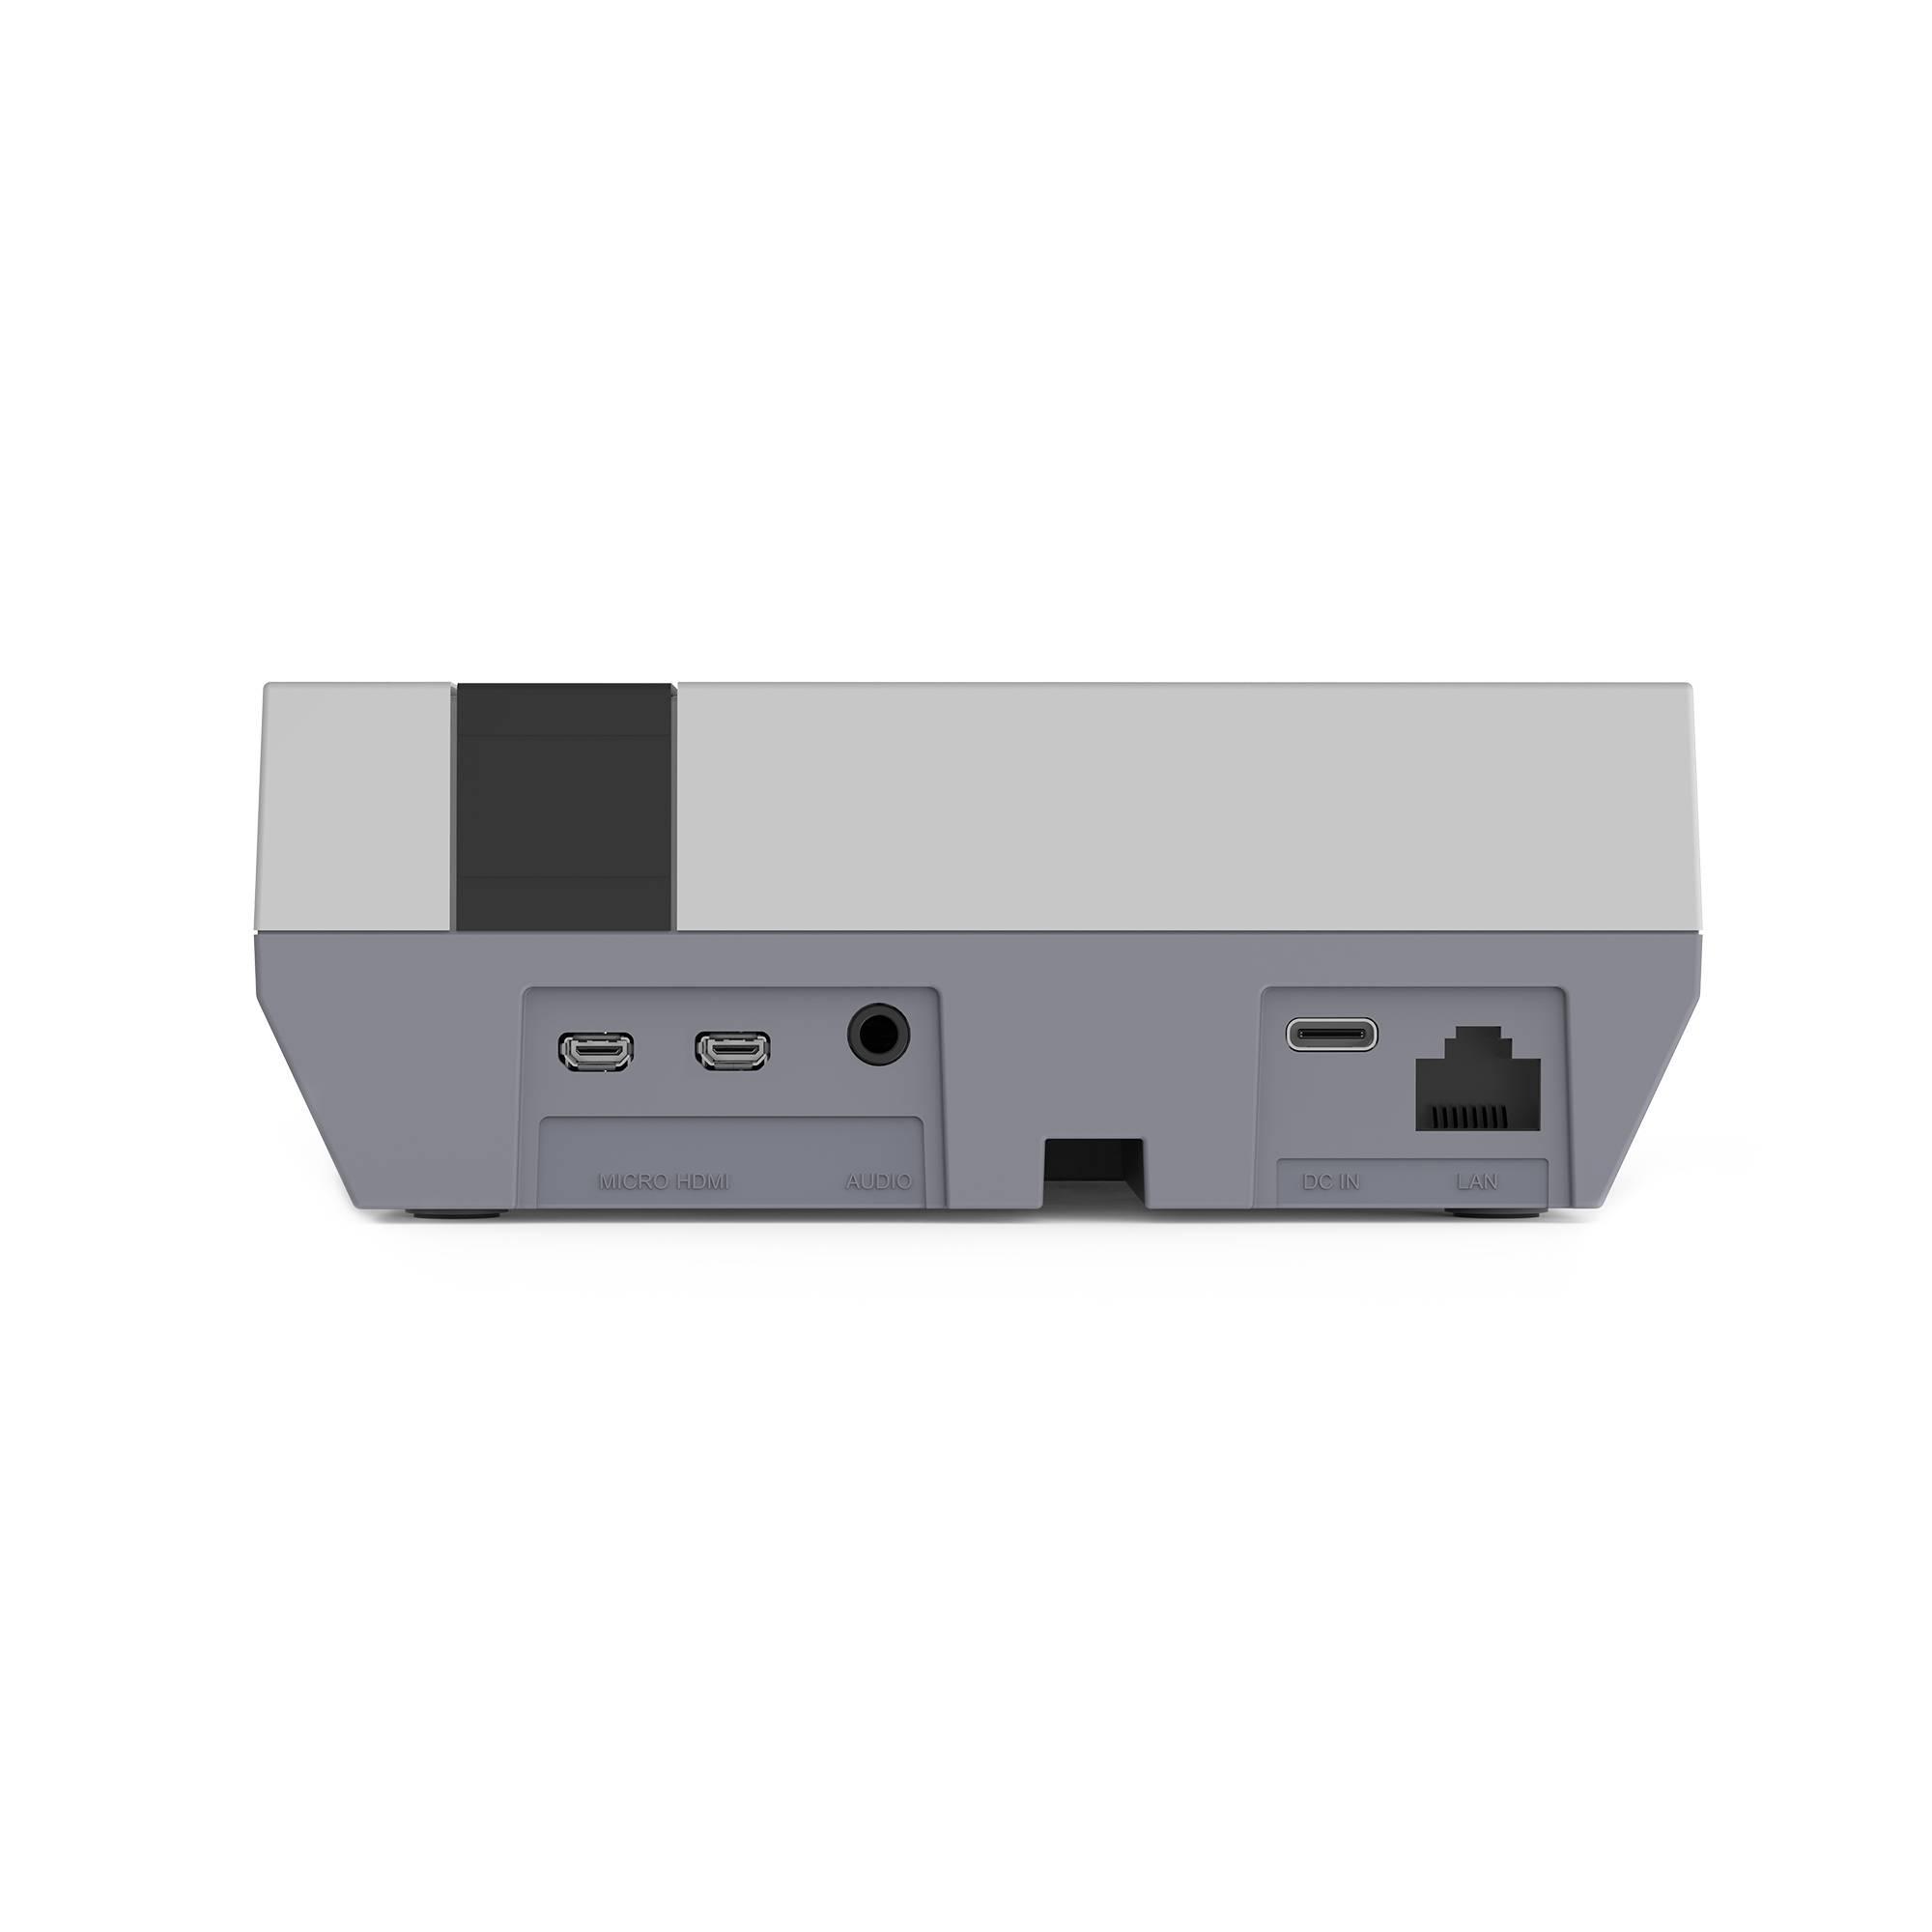 RETROFLAG NESPi 4 DIY Starting Kit for RetroPie Home Console - Showing the NESPi 4 from the back